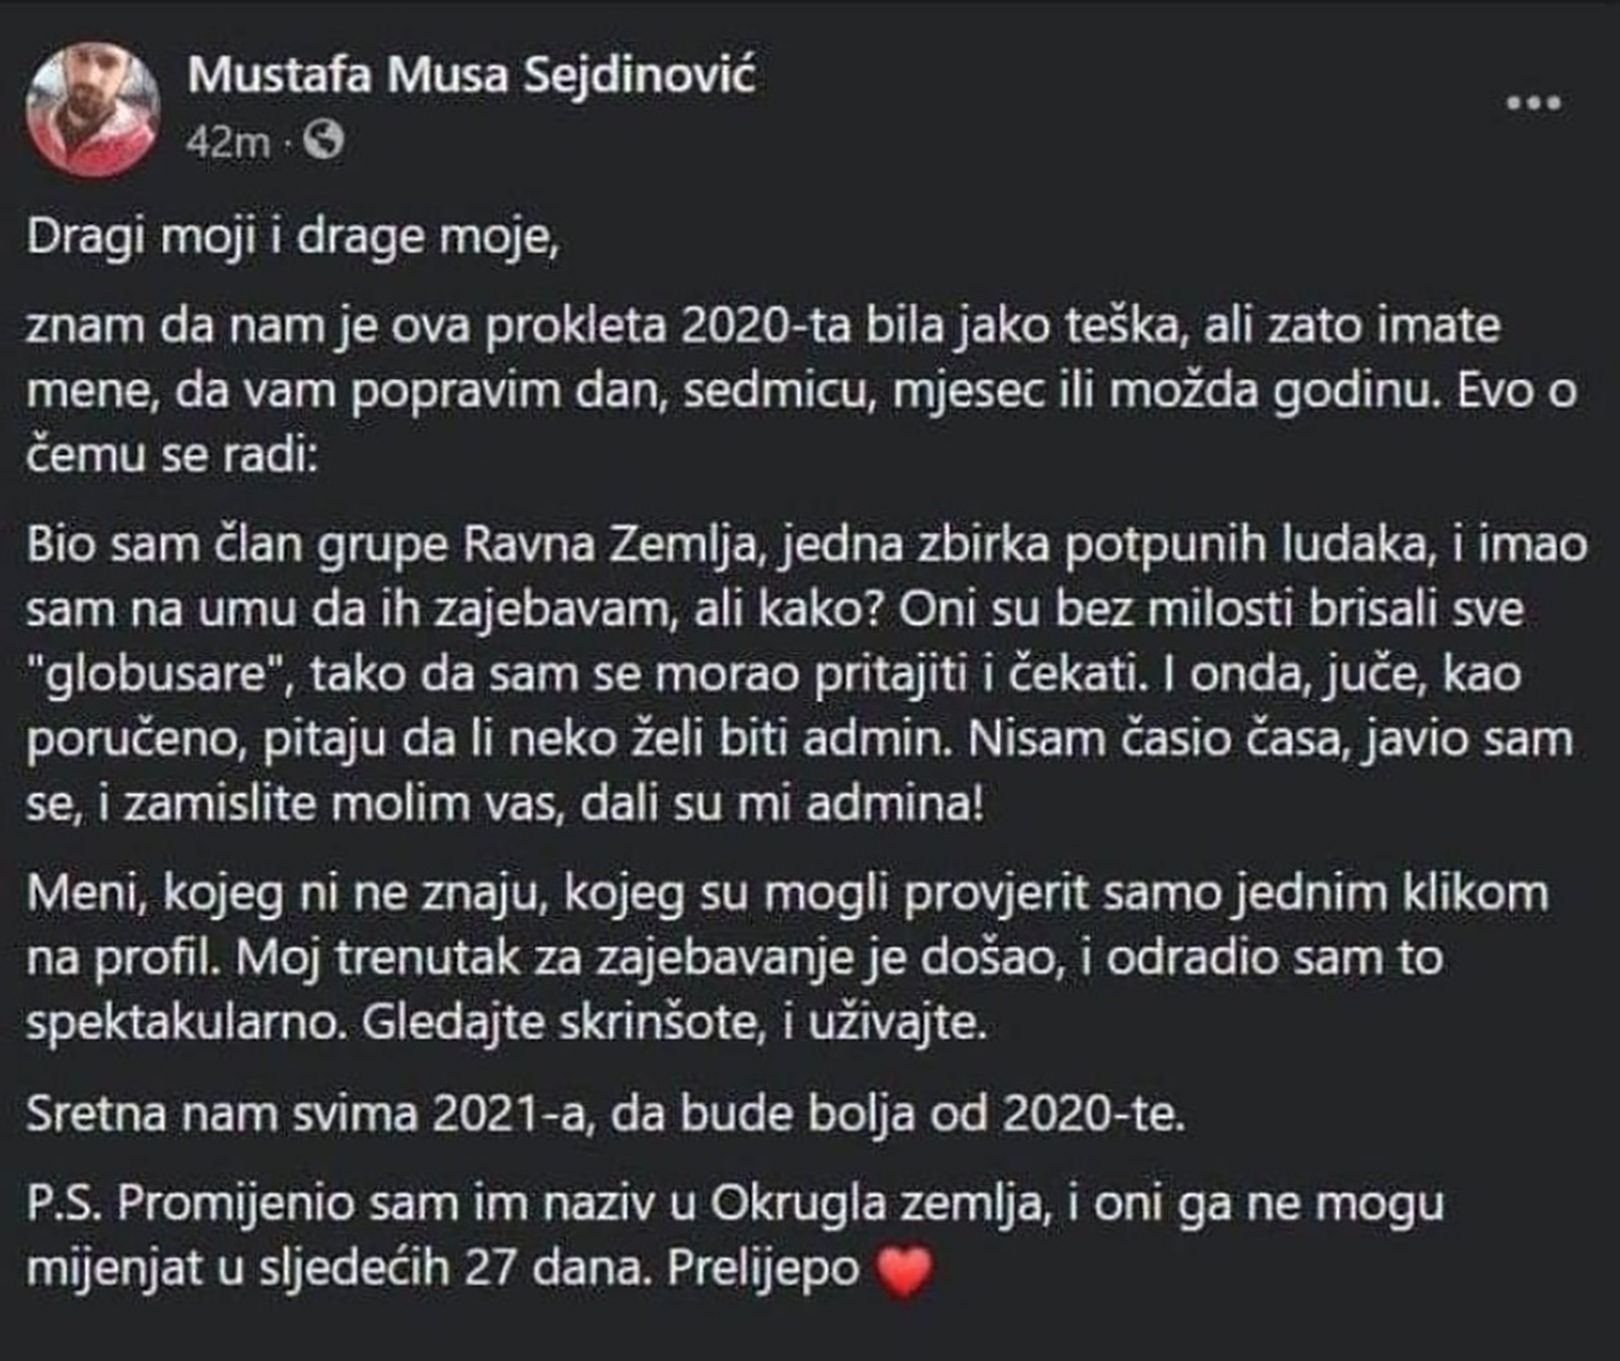 Mustafa Musa Sejdinovic